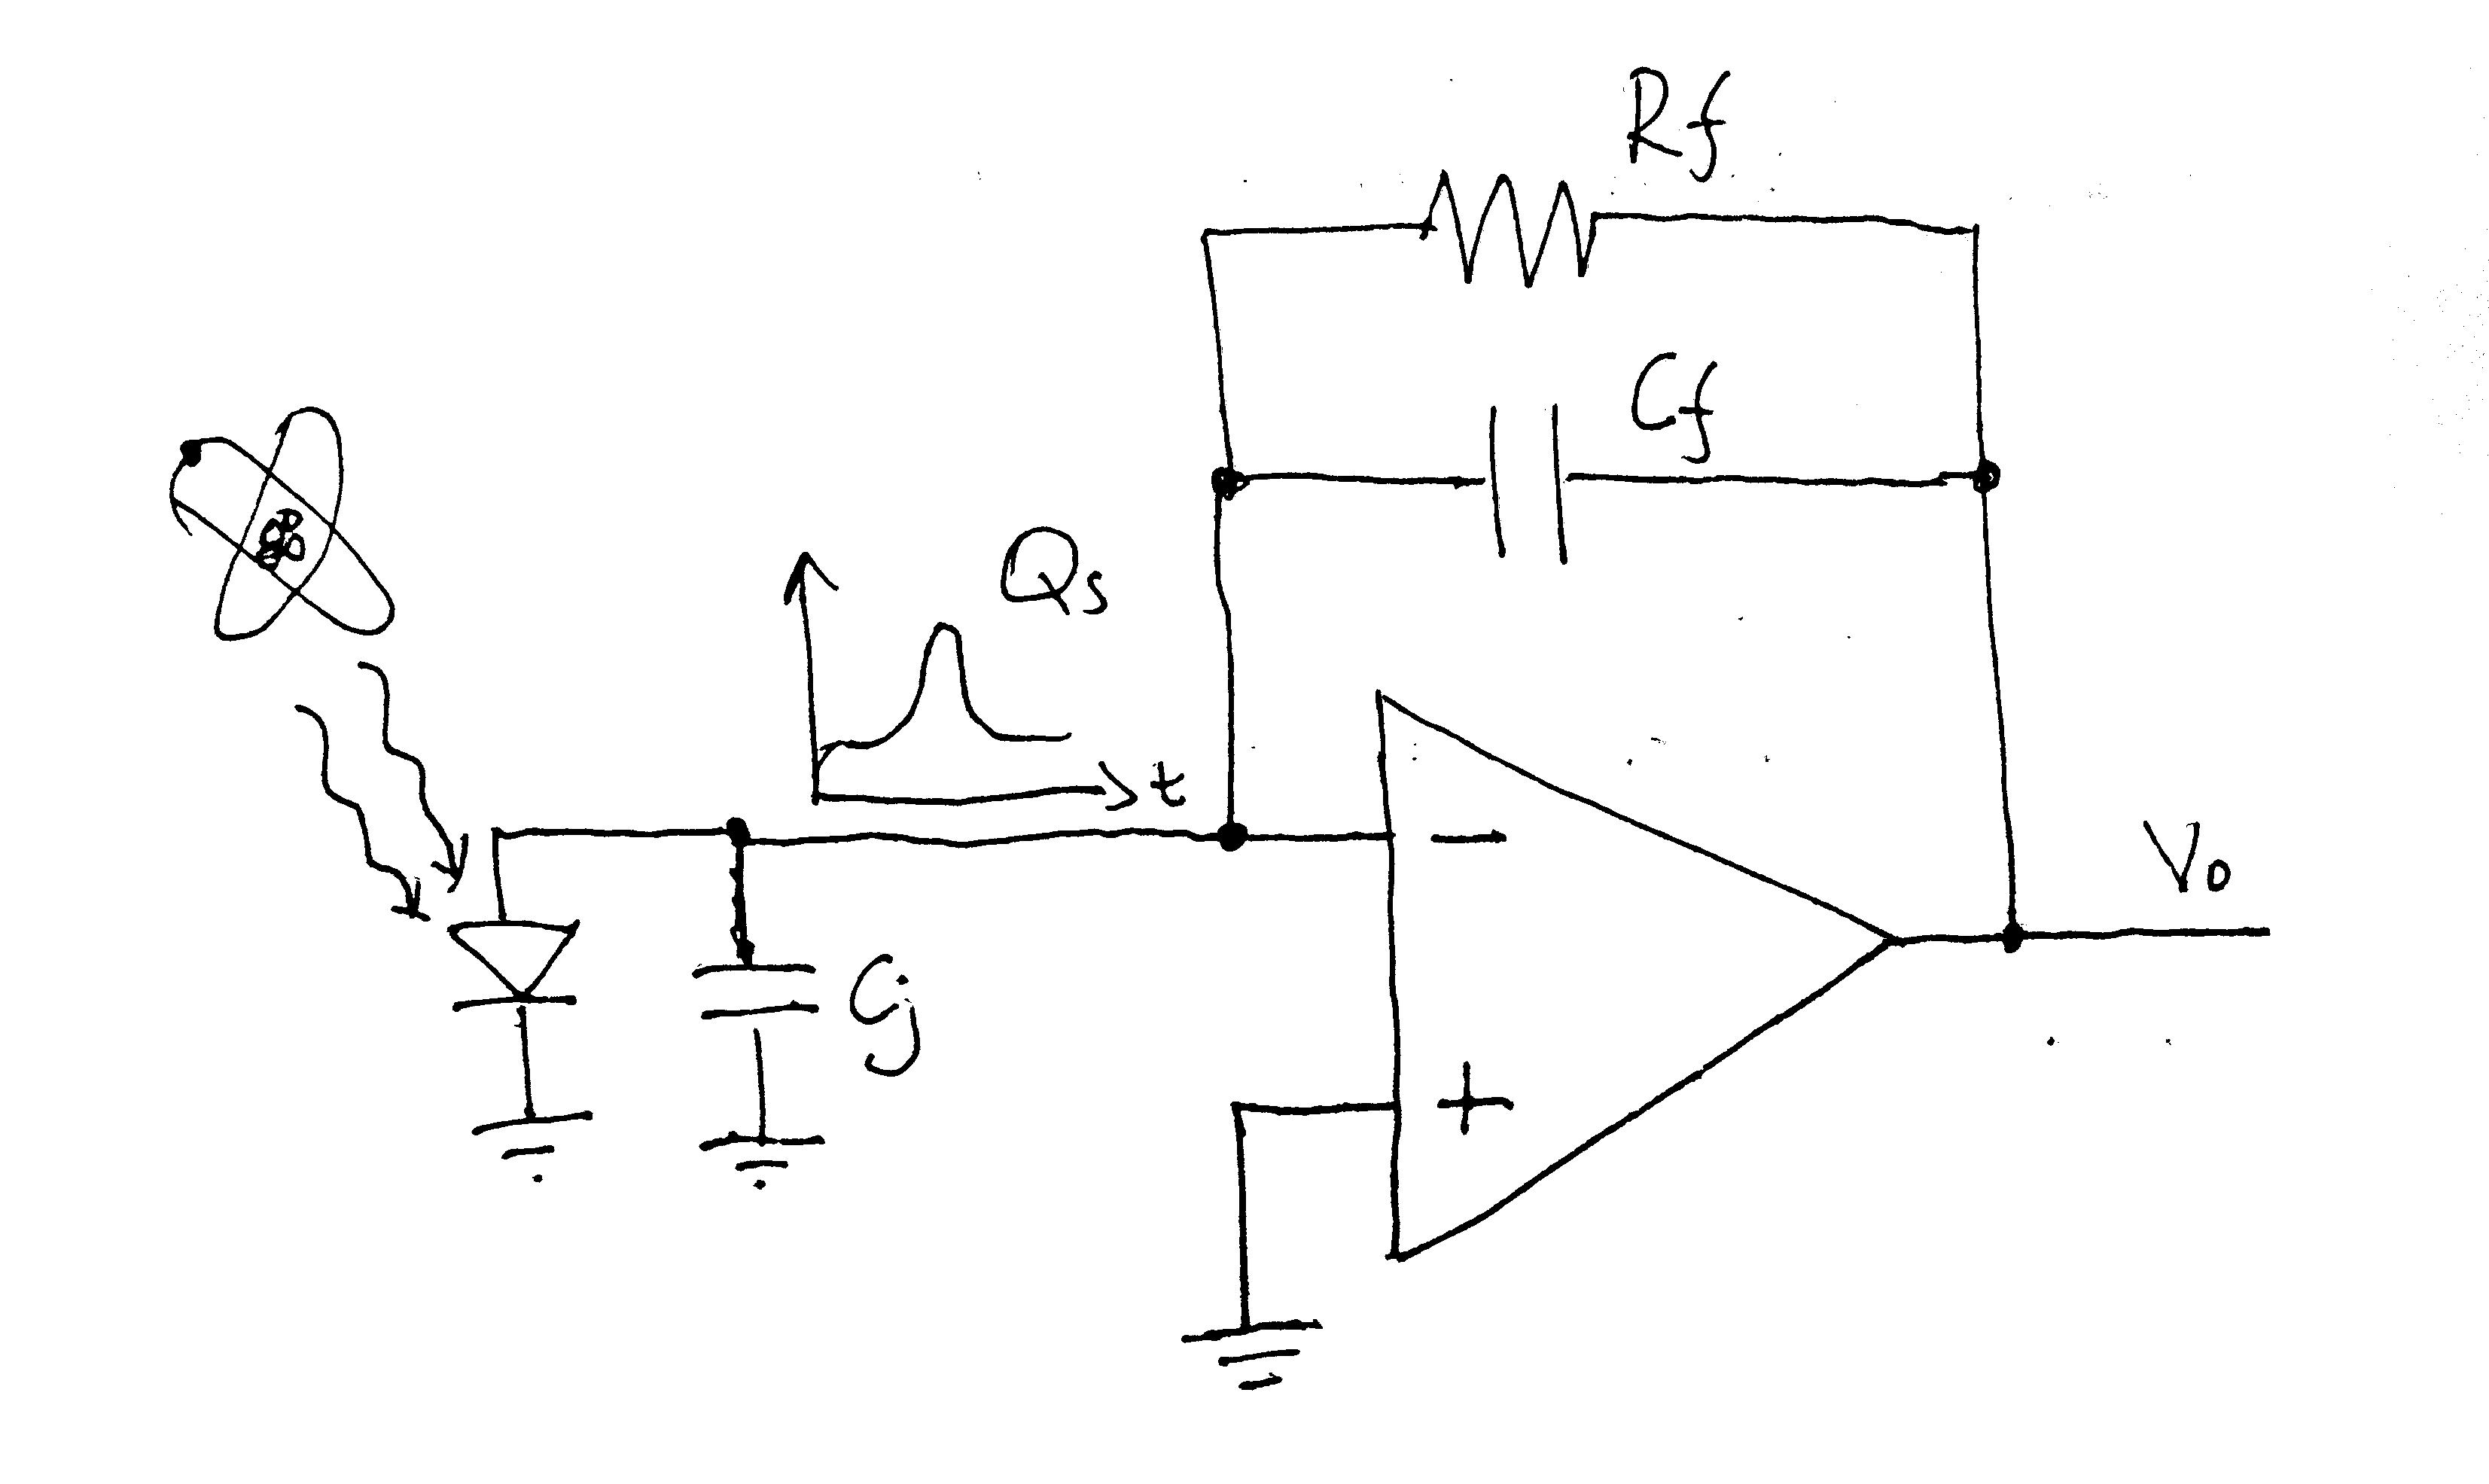 Flame Detector Circuit Schematic